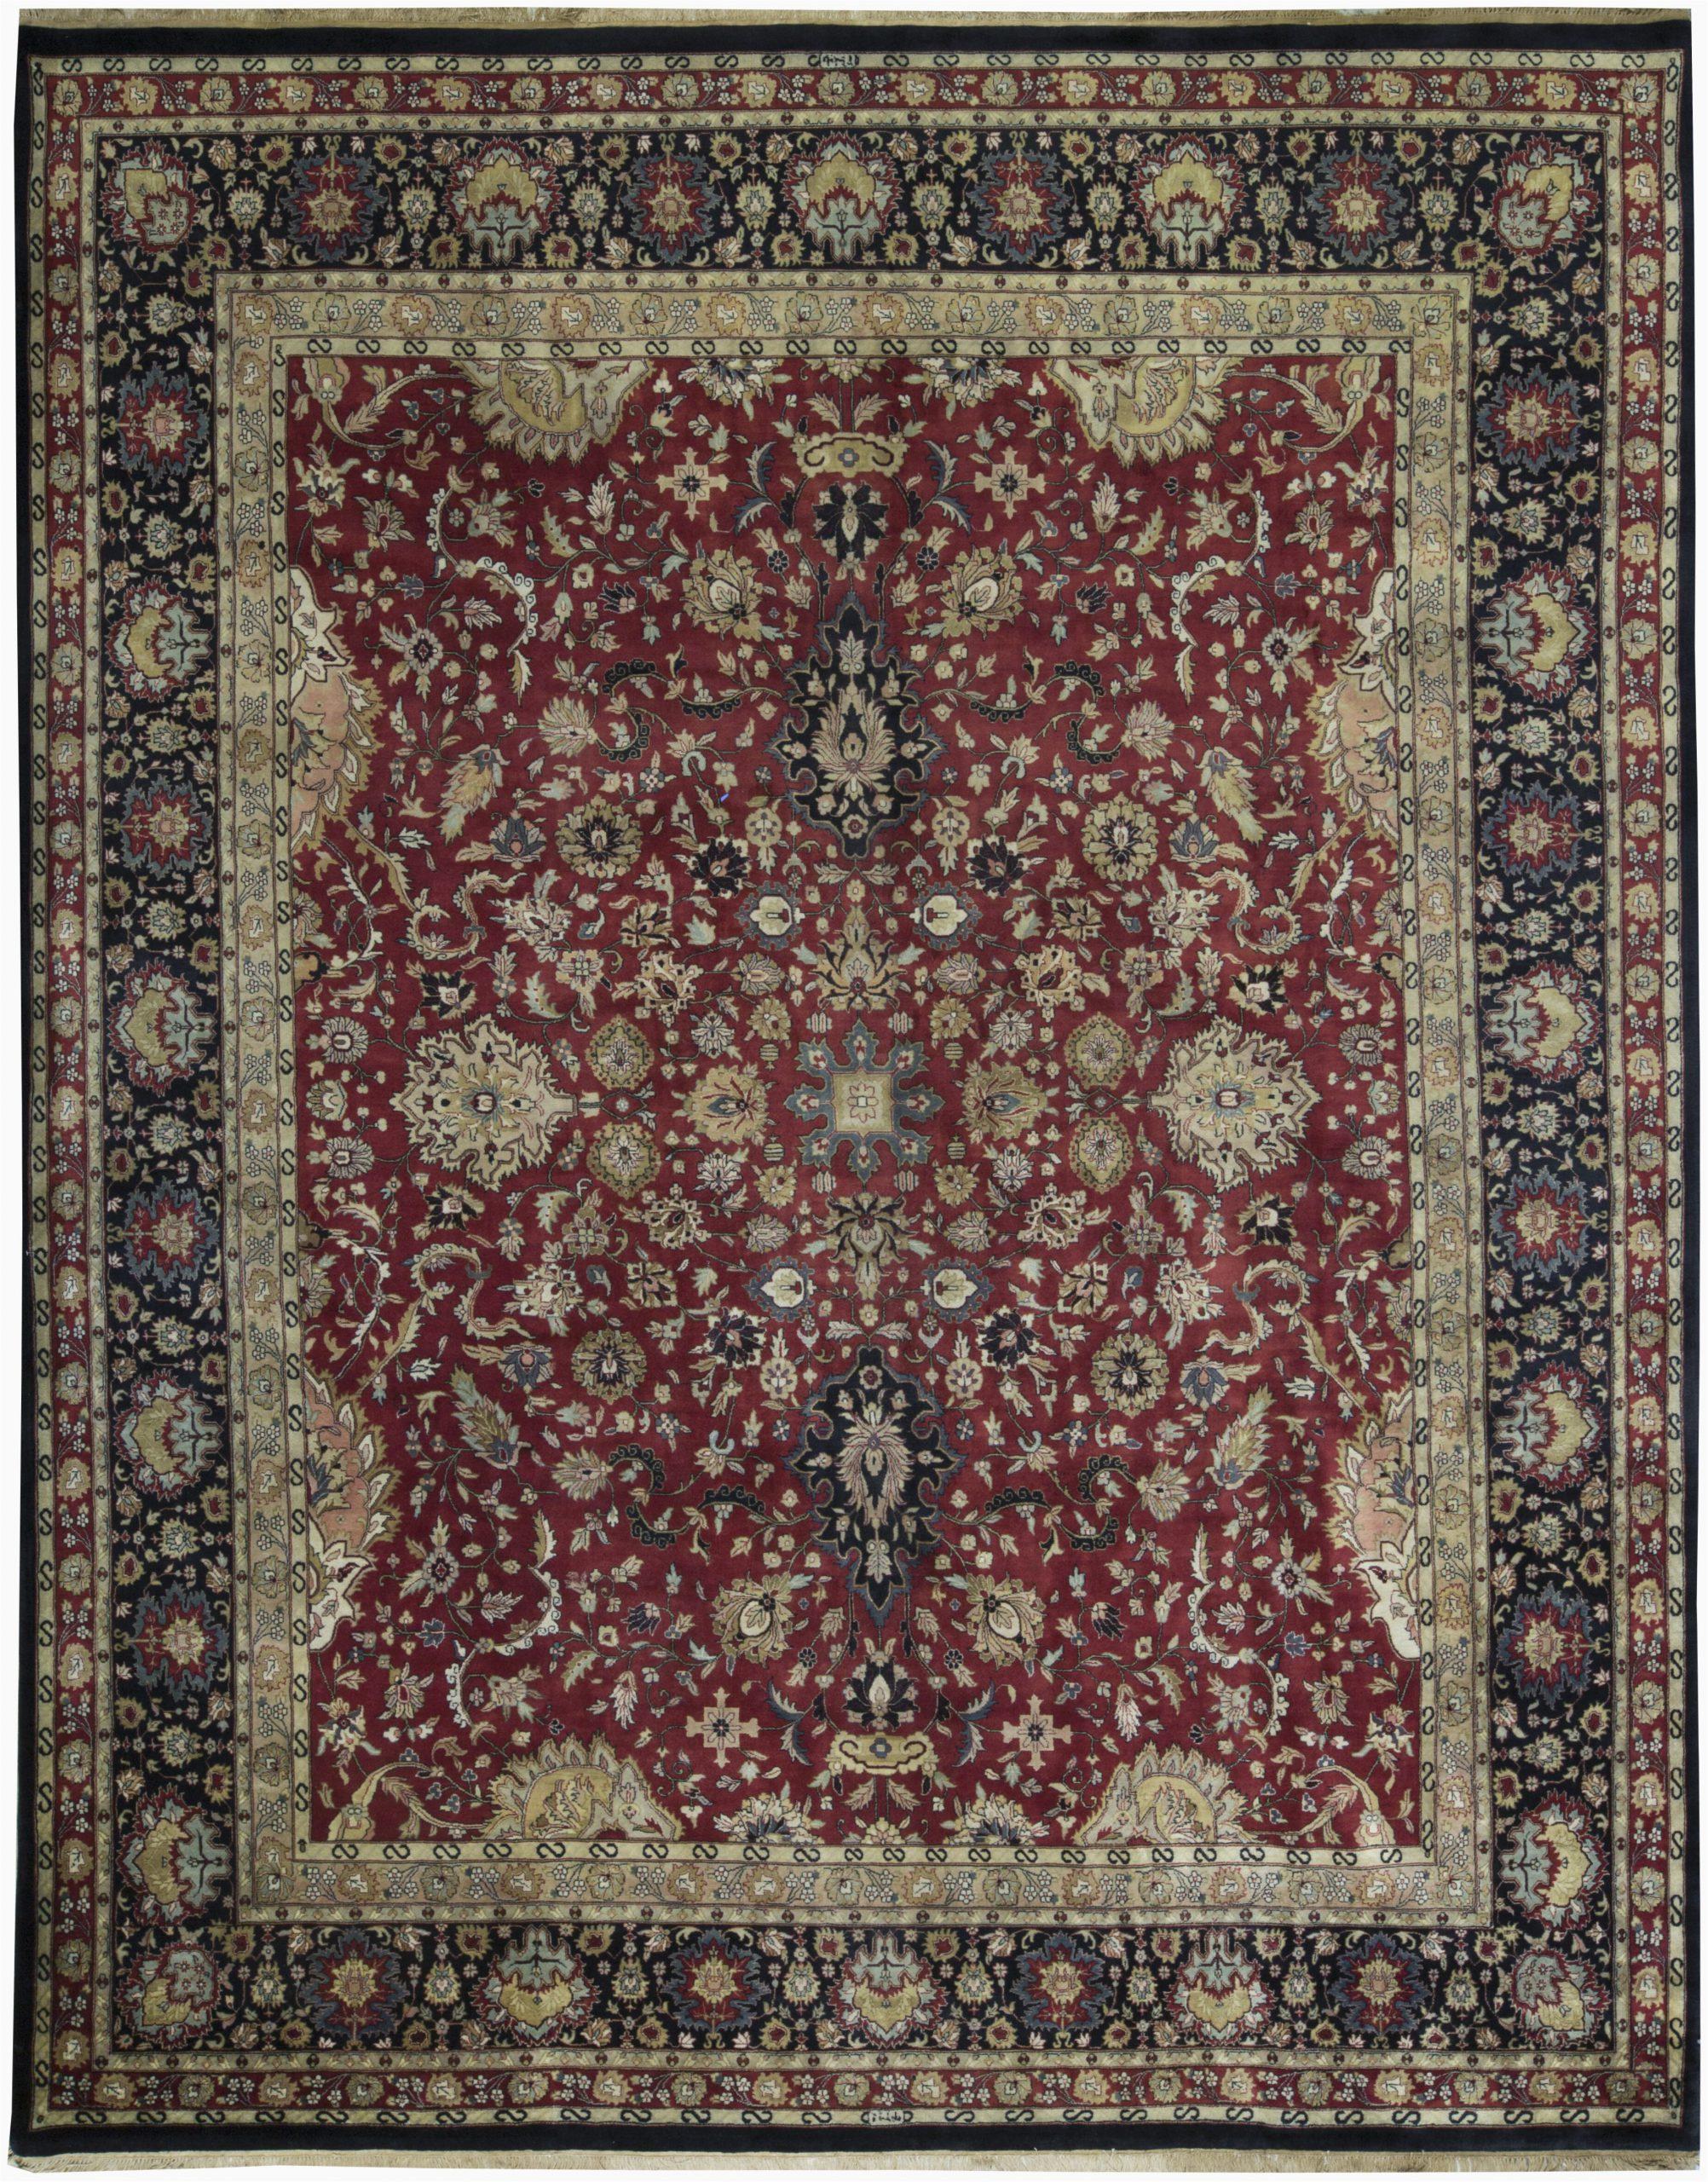 bokara rug co inc one of a kind hand knotted redblackbeige 122 x 154 wool area rug abhd3003